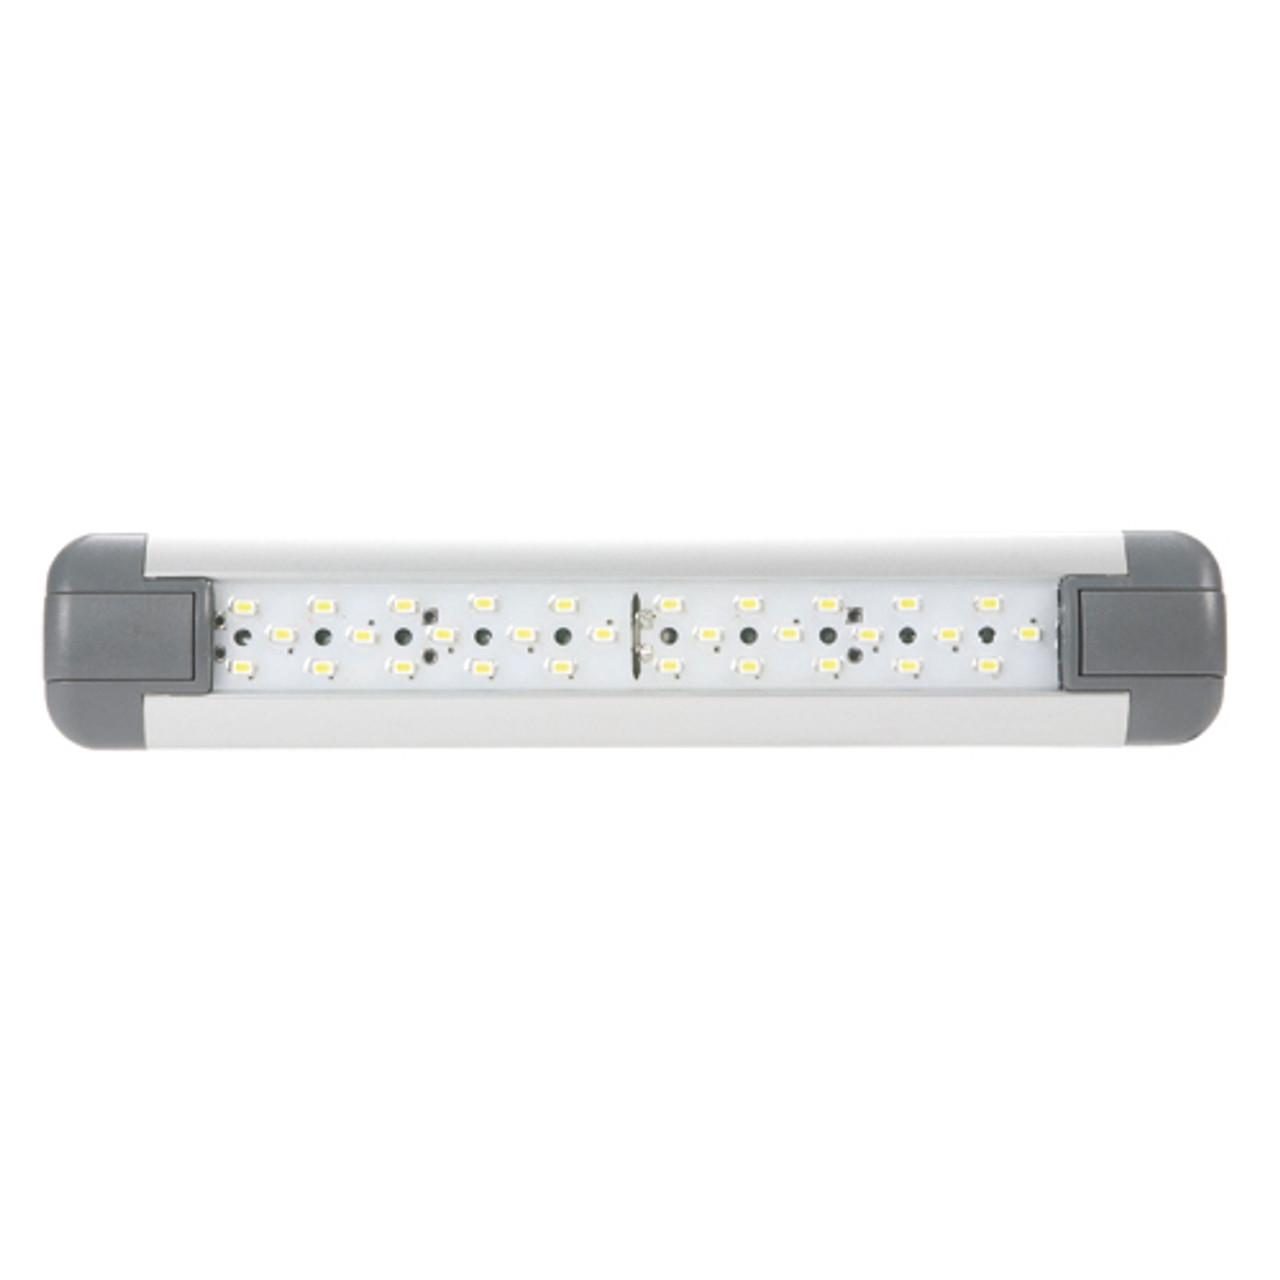 ISLS290MV Interior LED Strip Lamp. Slim and Narrow Unit. Multi-Volt 10v & 24 Volts DC. Push Button On & Off Switch. Single Pack. Tough Unit, Alloy Housing. Length is 290mm Long. 4 watt light. 3 Year Warranty. RoadVision. Ultimate LED.